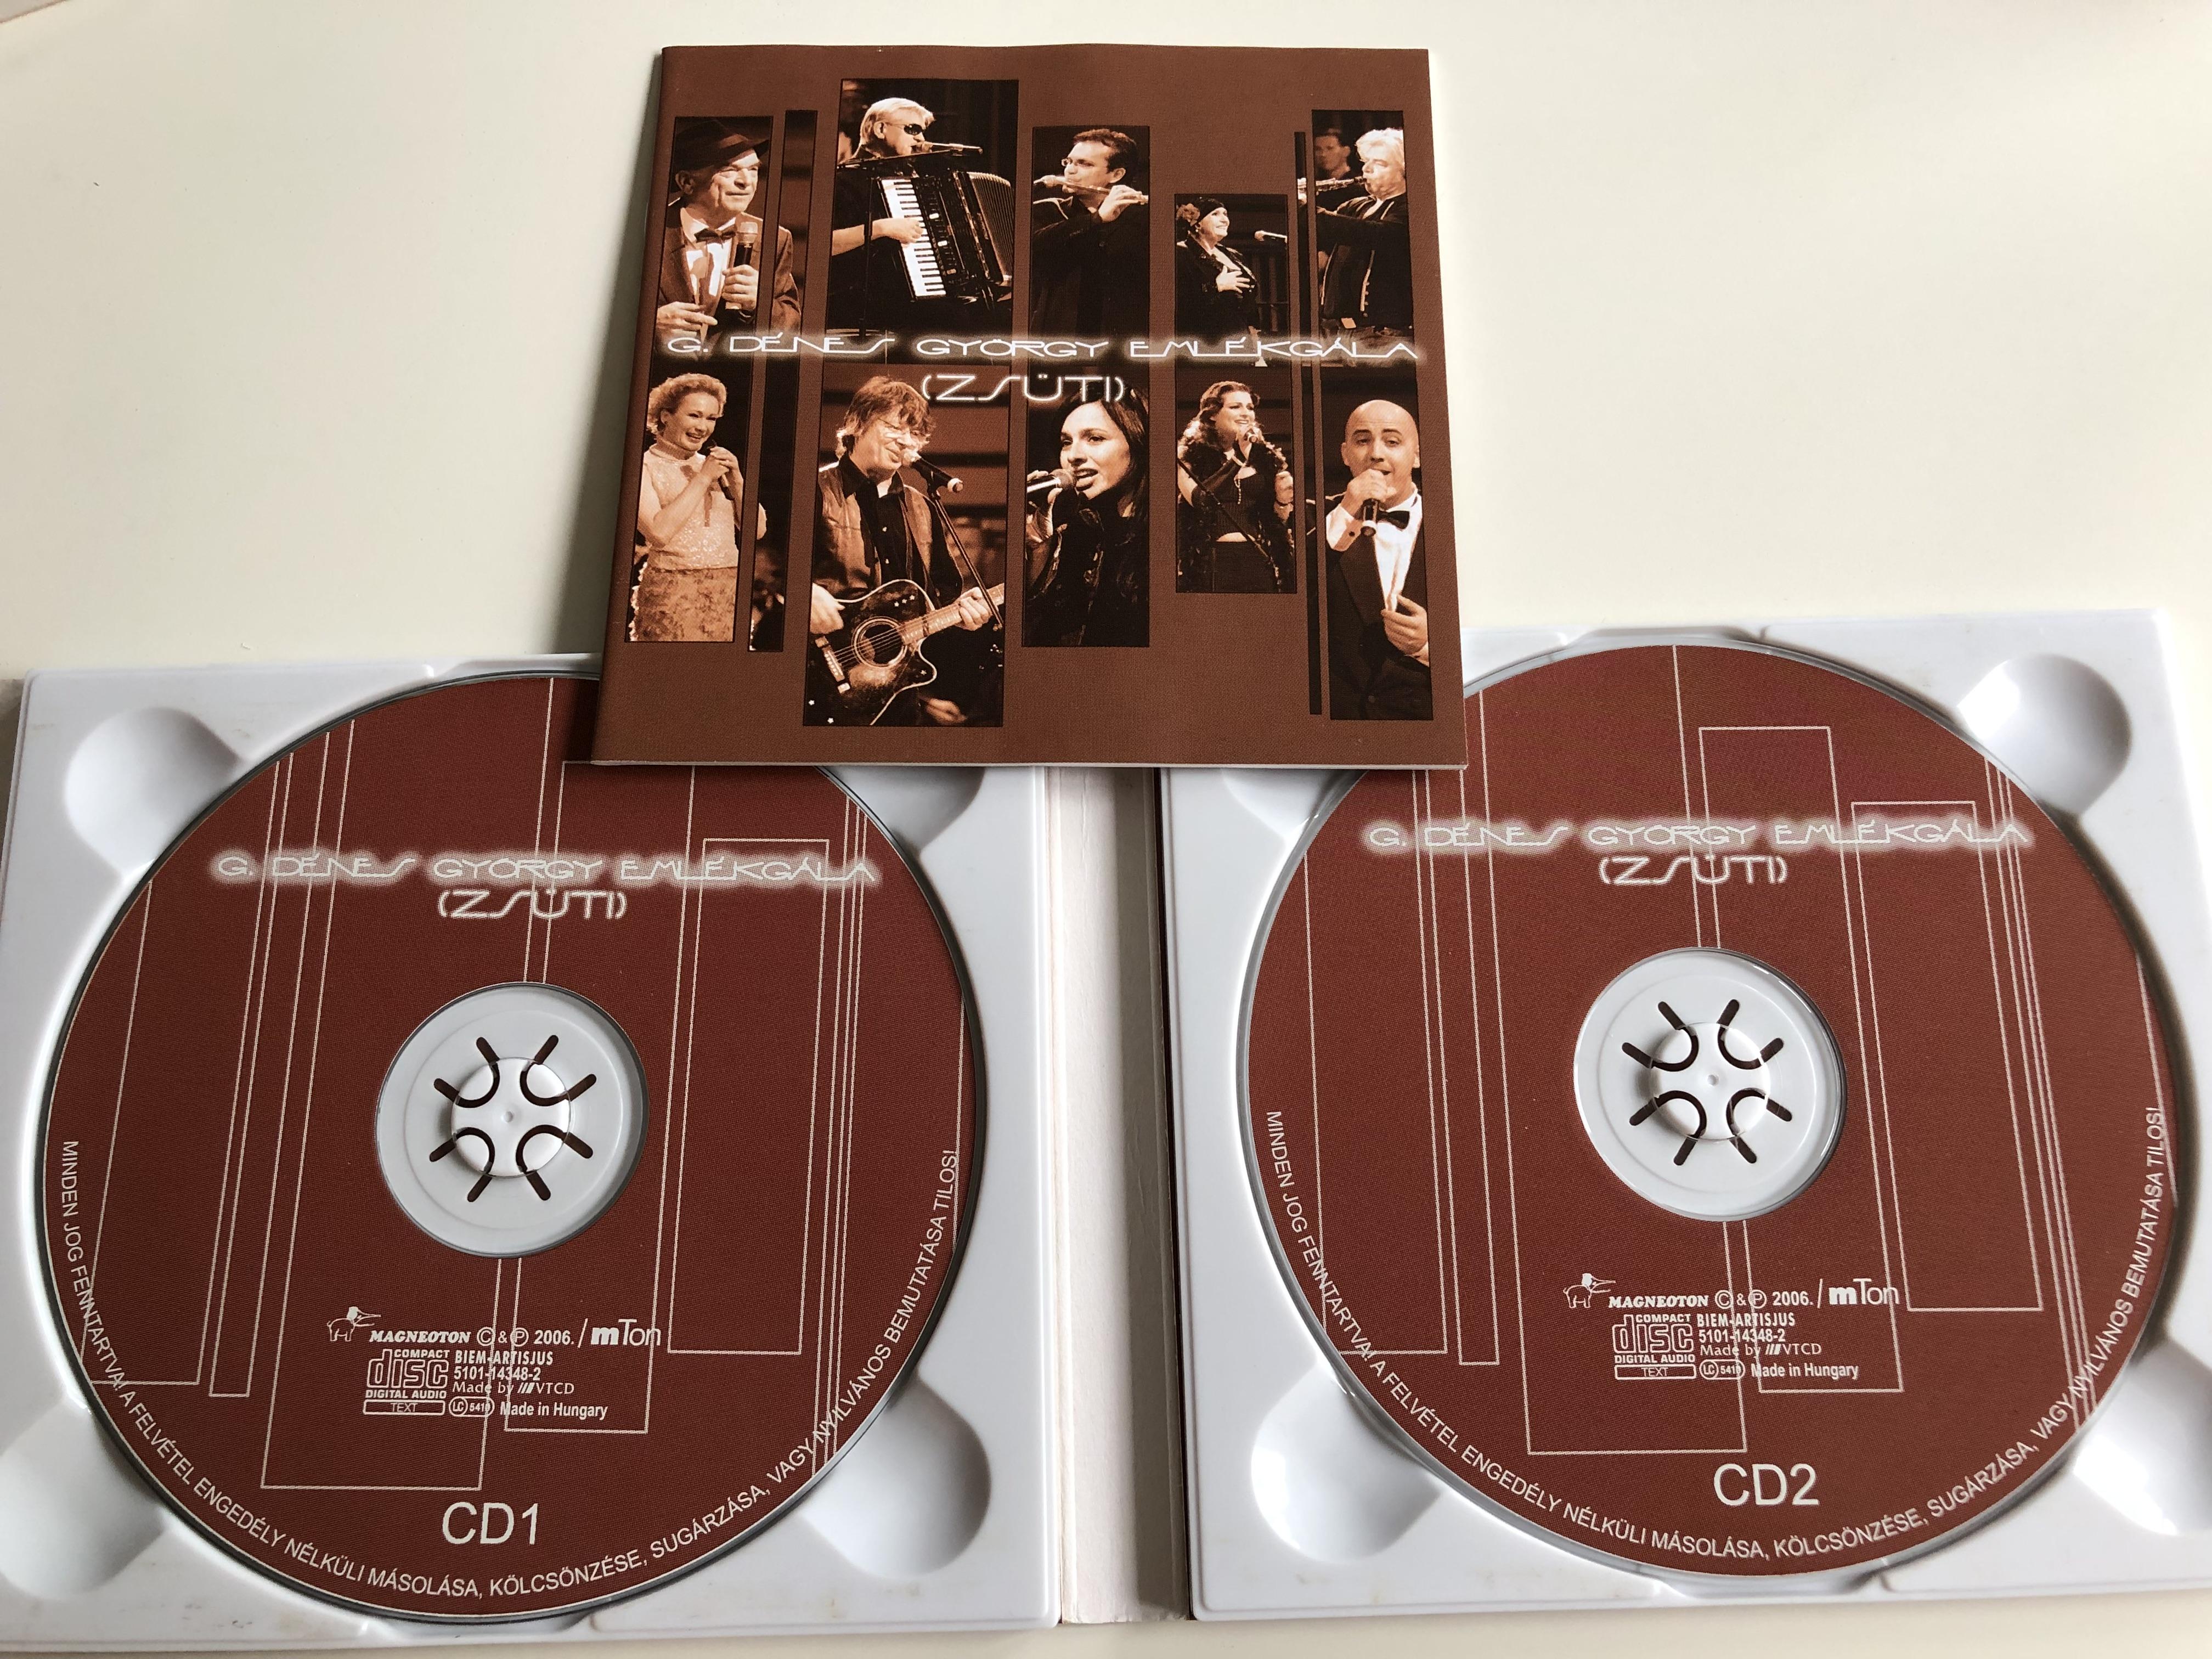 g.-d-nes-gy-rgy-eml-kg-la-zs-ti-danubia-symphony-orchestra-r-tonyi-r-bert-concert-master-bujtor-bal-zs-magneoton-audio-cd-2006-3-.jpg